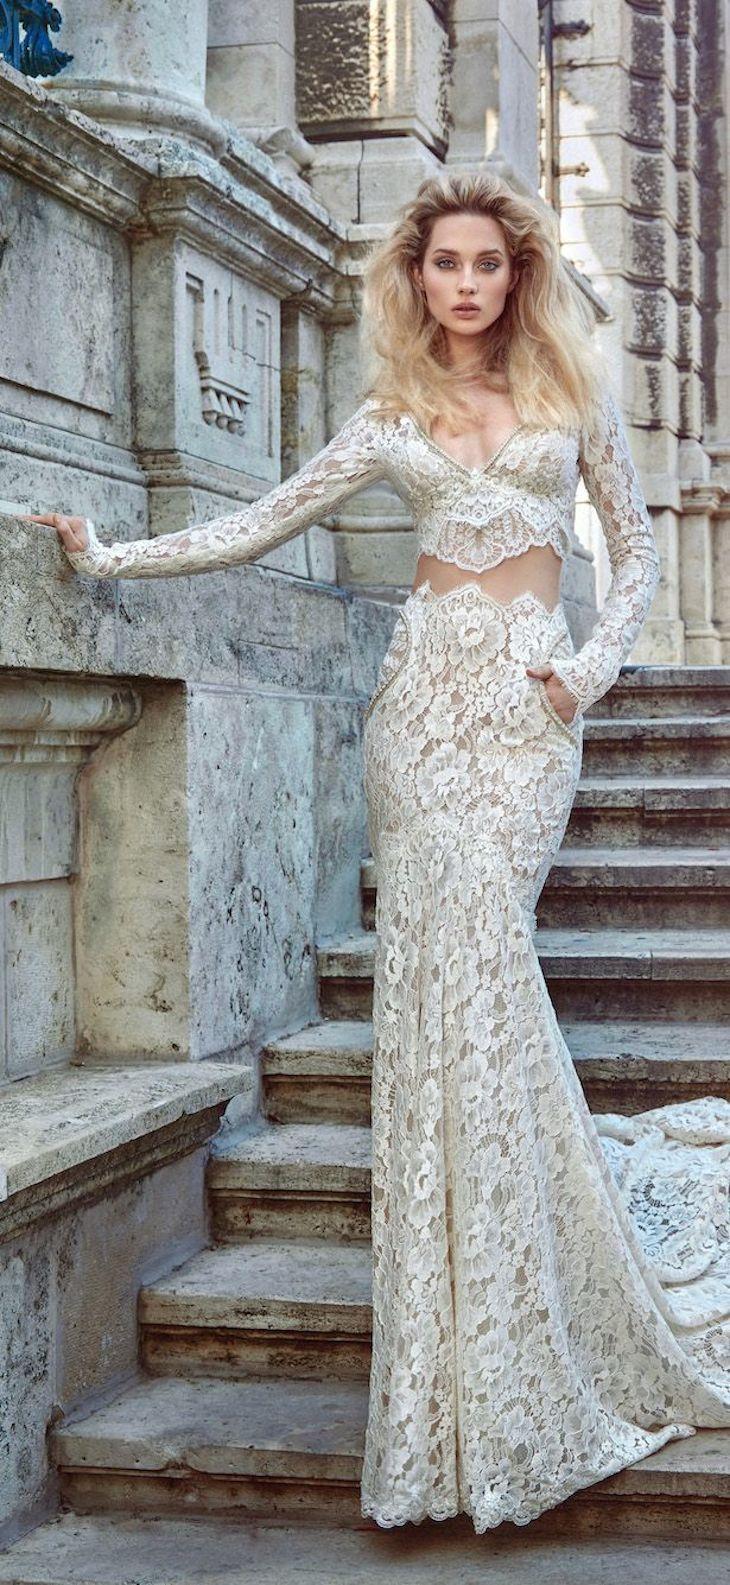 popular wedding dresses for most popular wedding dresses Top 10 Popular Wedding Dresses for